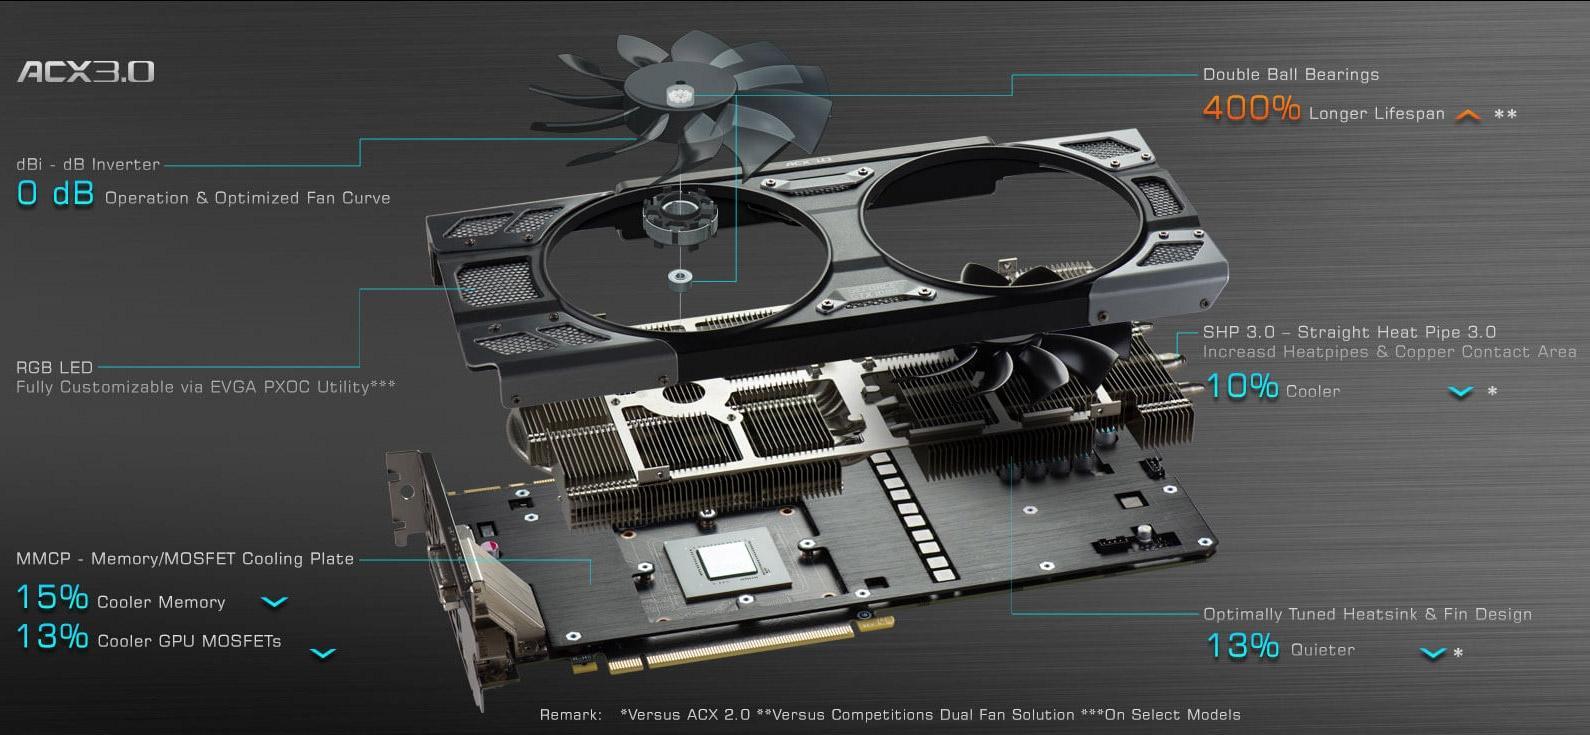 22 модели видеокарт EVGA GeForce GTX 1080/1070/1060 могут